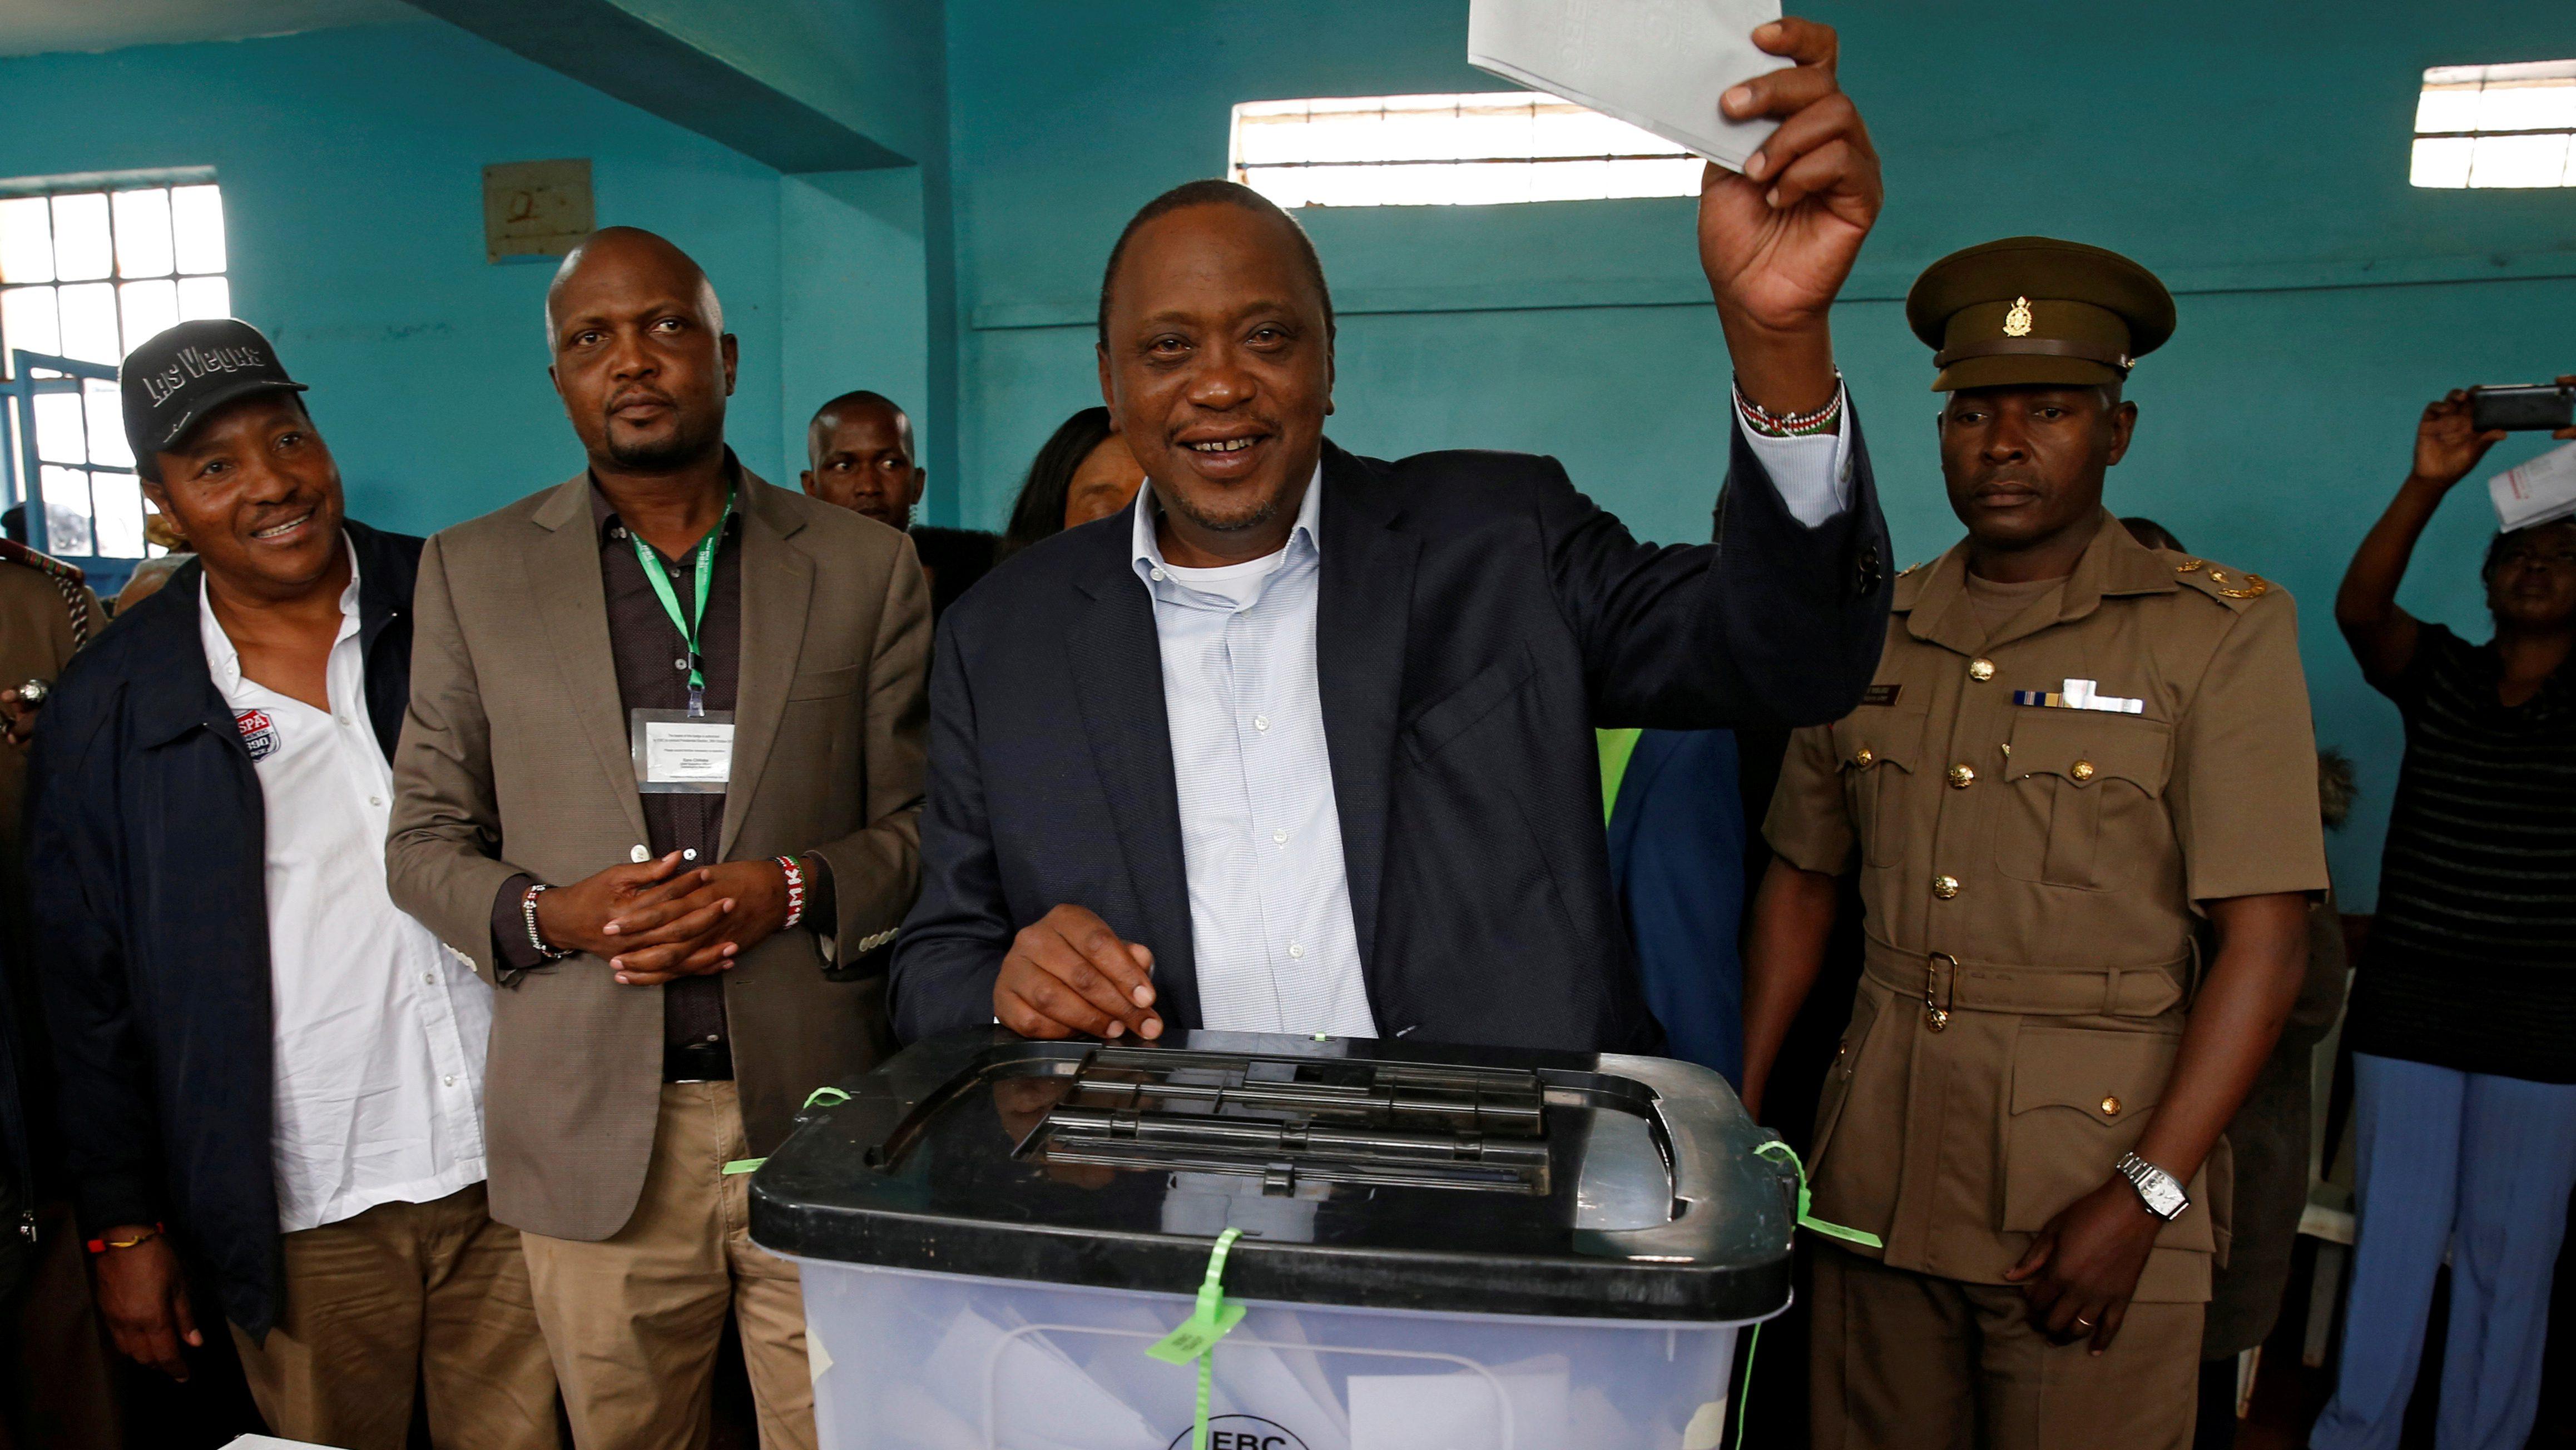 Kenya's President Uhuru Kenyatta casts his vote during a presidential election re-run in Gatundu, Kenya October 26, 2017.